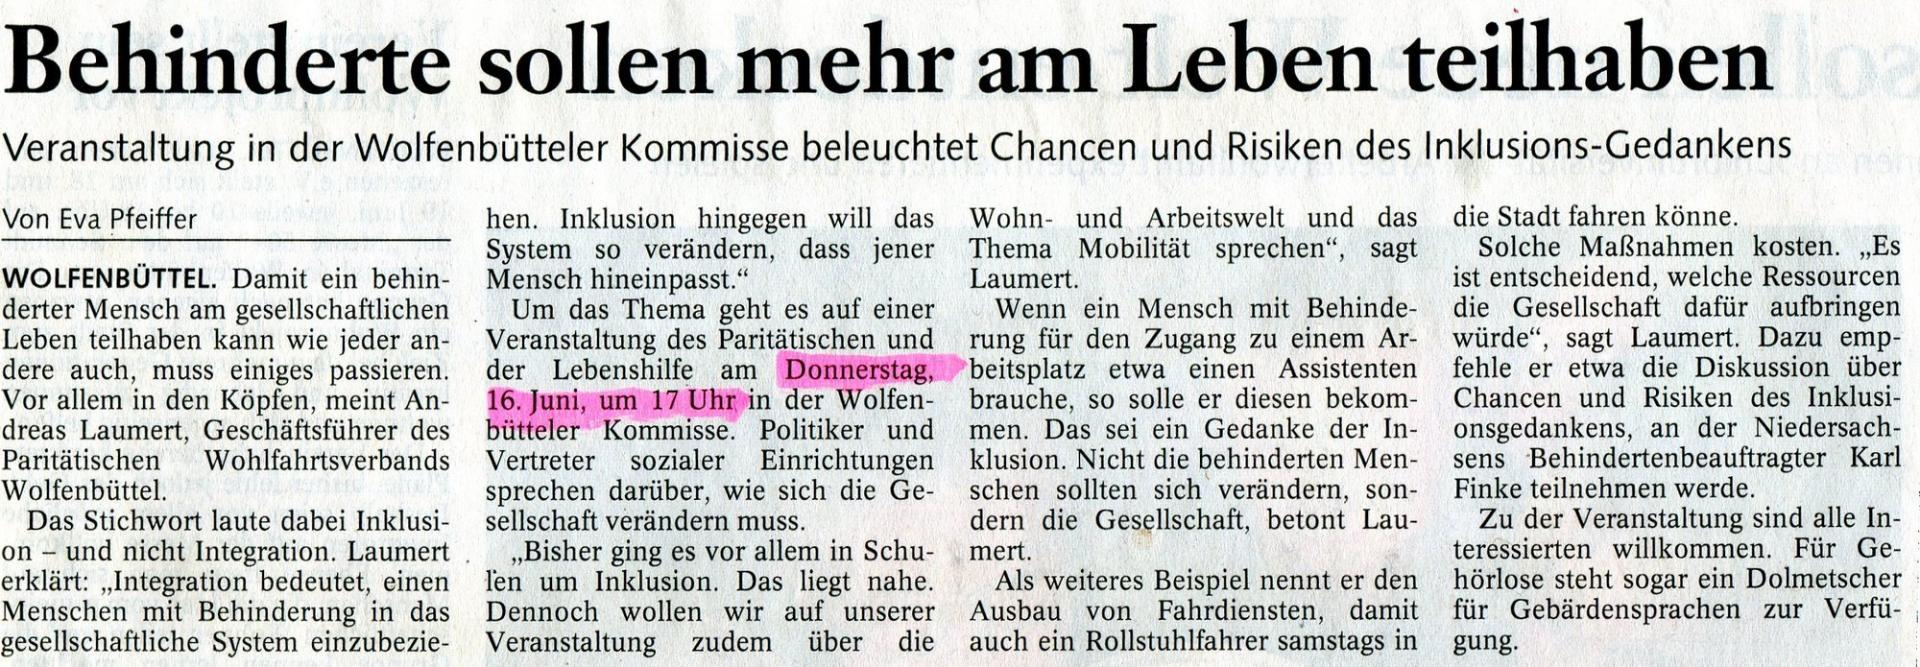 Zeitung3